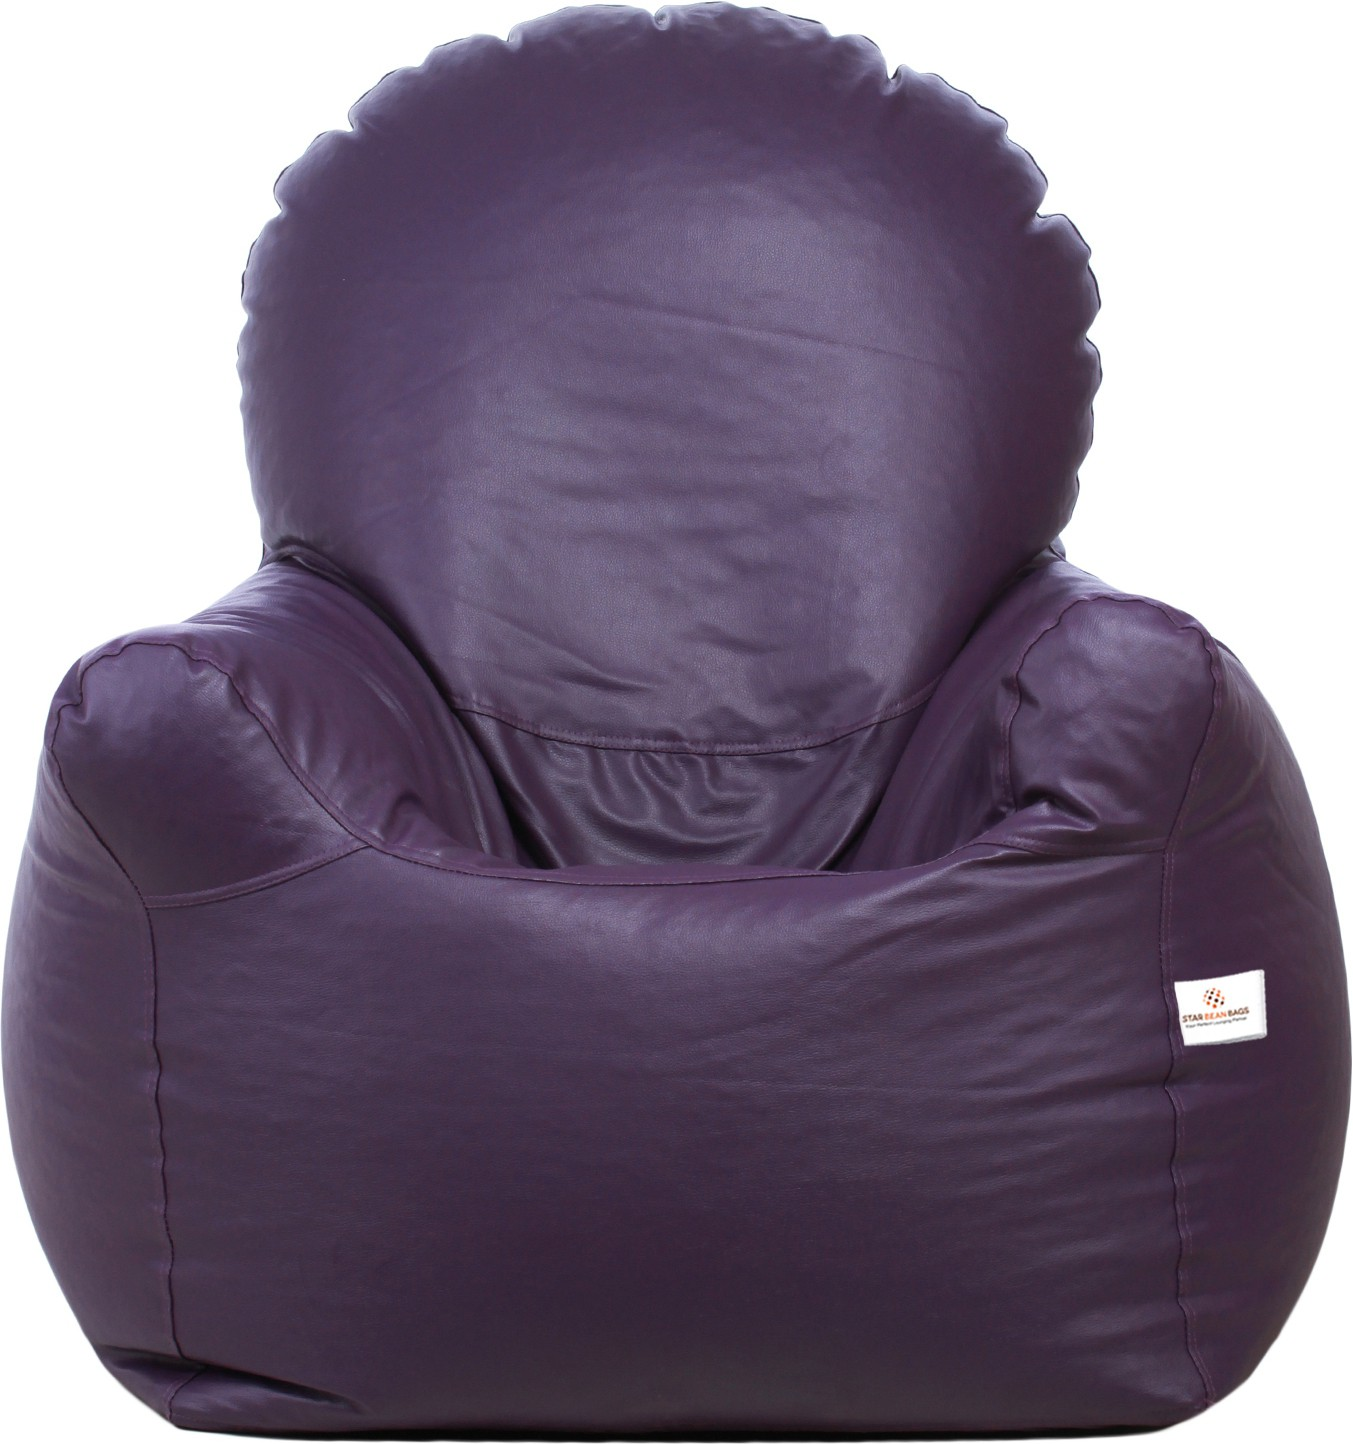 View Star XXL Emperor Arm Chair Bean Bag Chair  With Bean Filling(Purple) Furniture (Star)